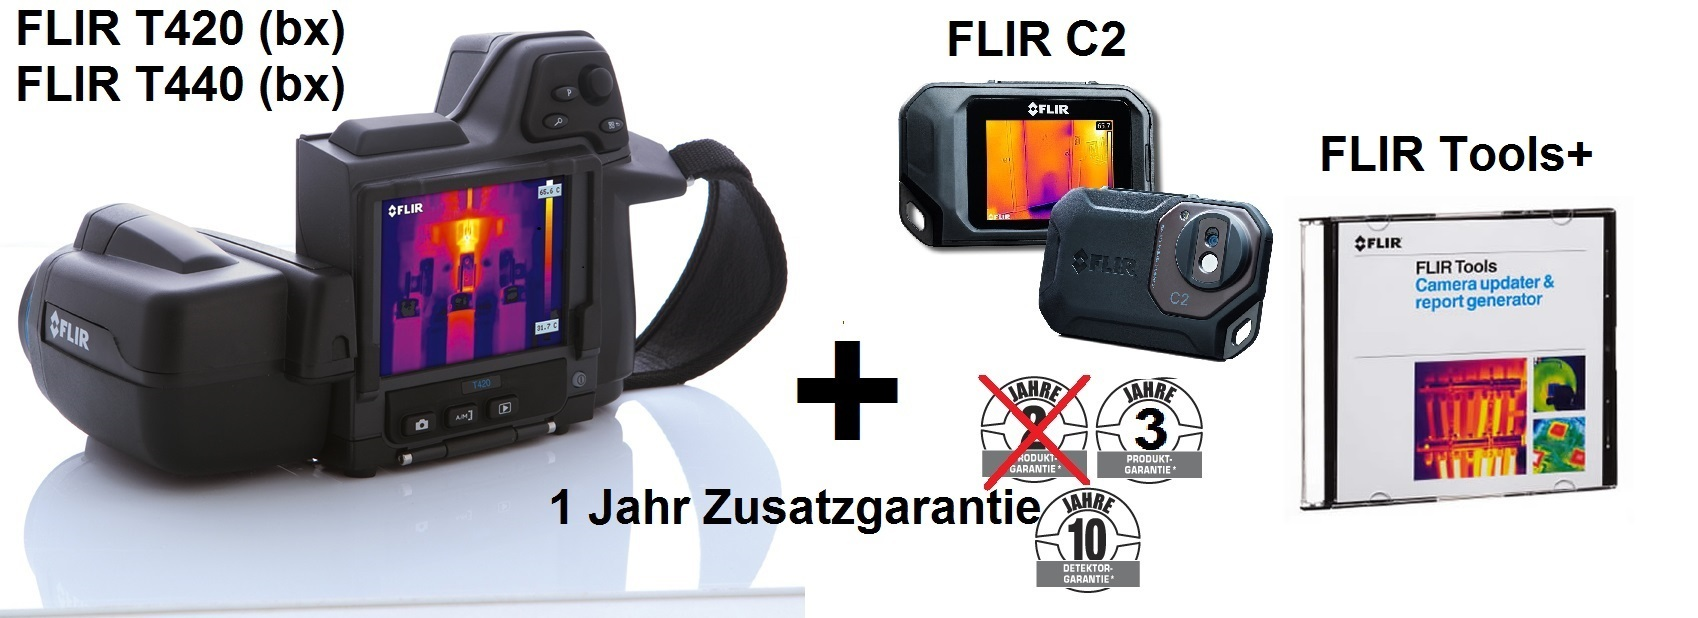 flir t440 infaredcamera special offer flir infrarotkameras de rh flir infrarotkameras de flir t440 user manual flir t440 manual español